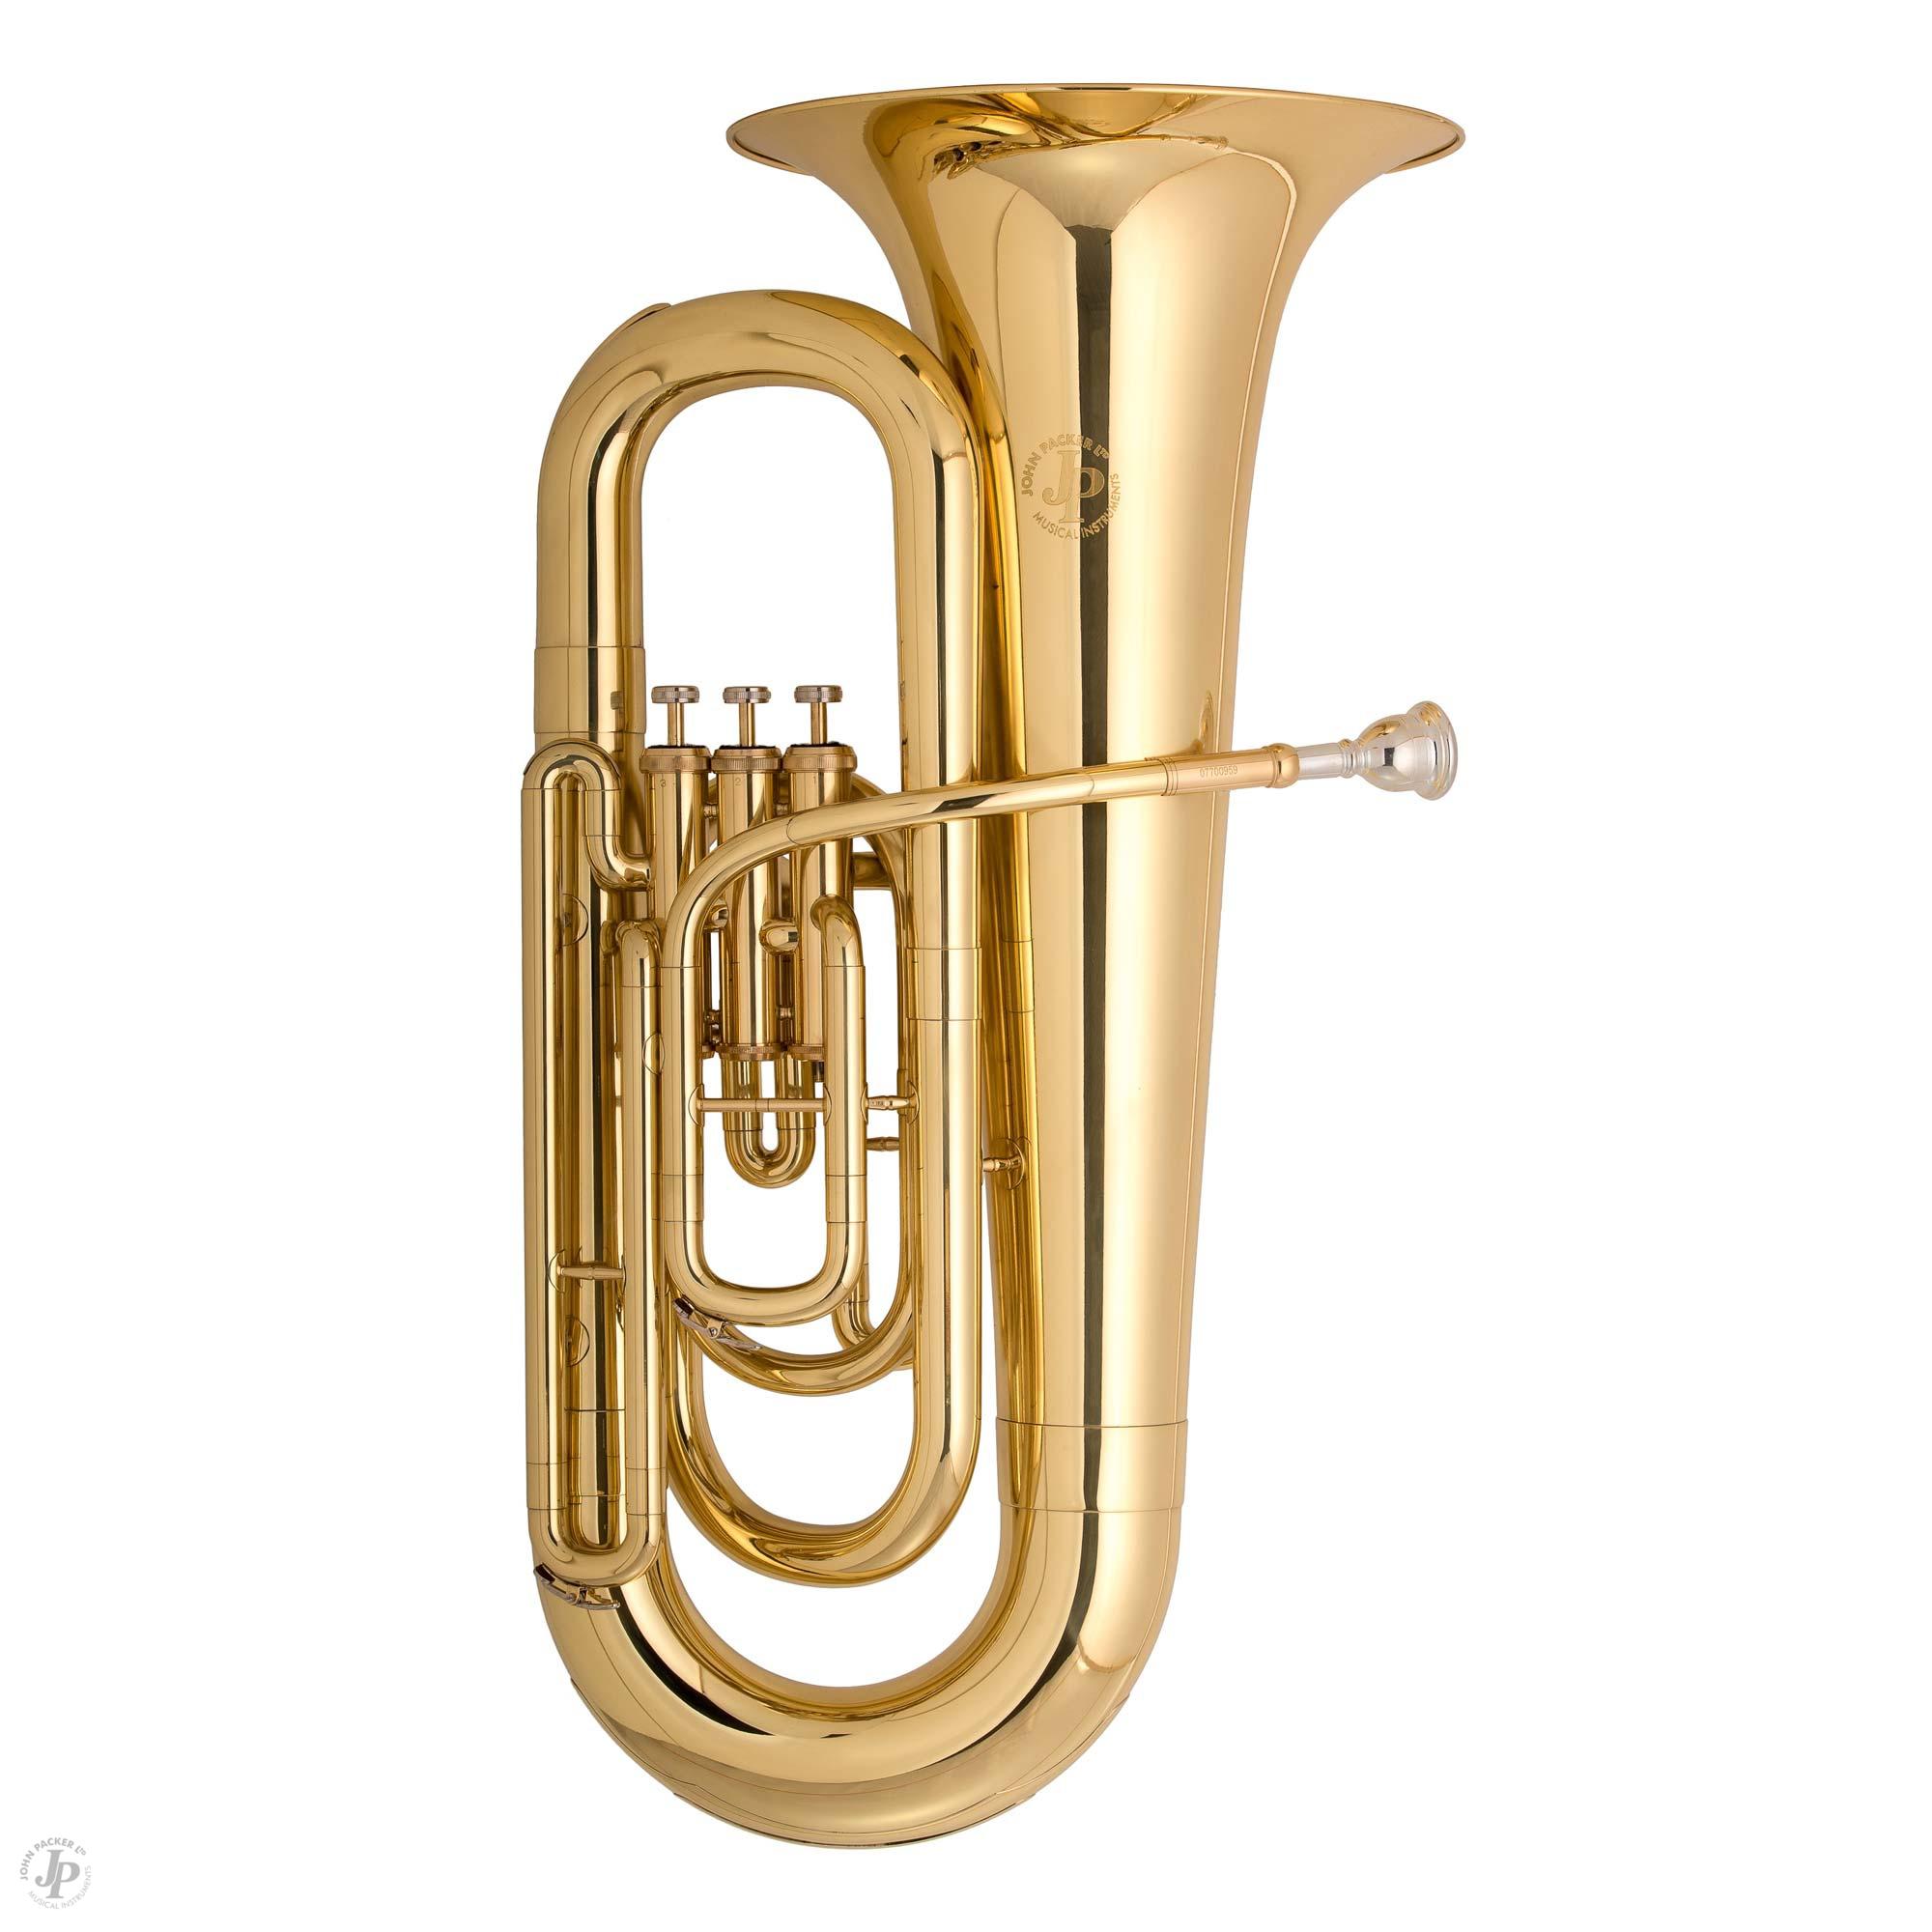 PNG Tuba Transparent Tuba.PNG Images..